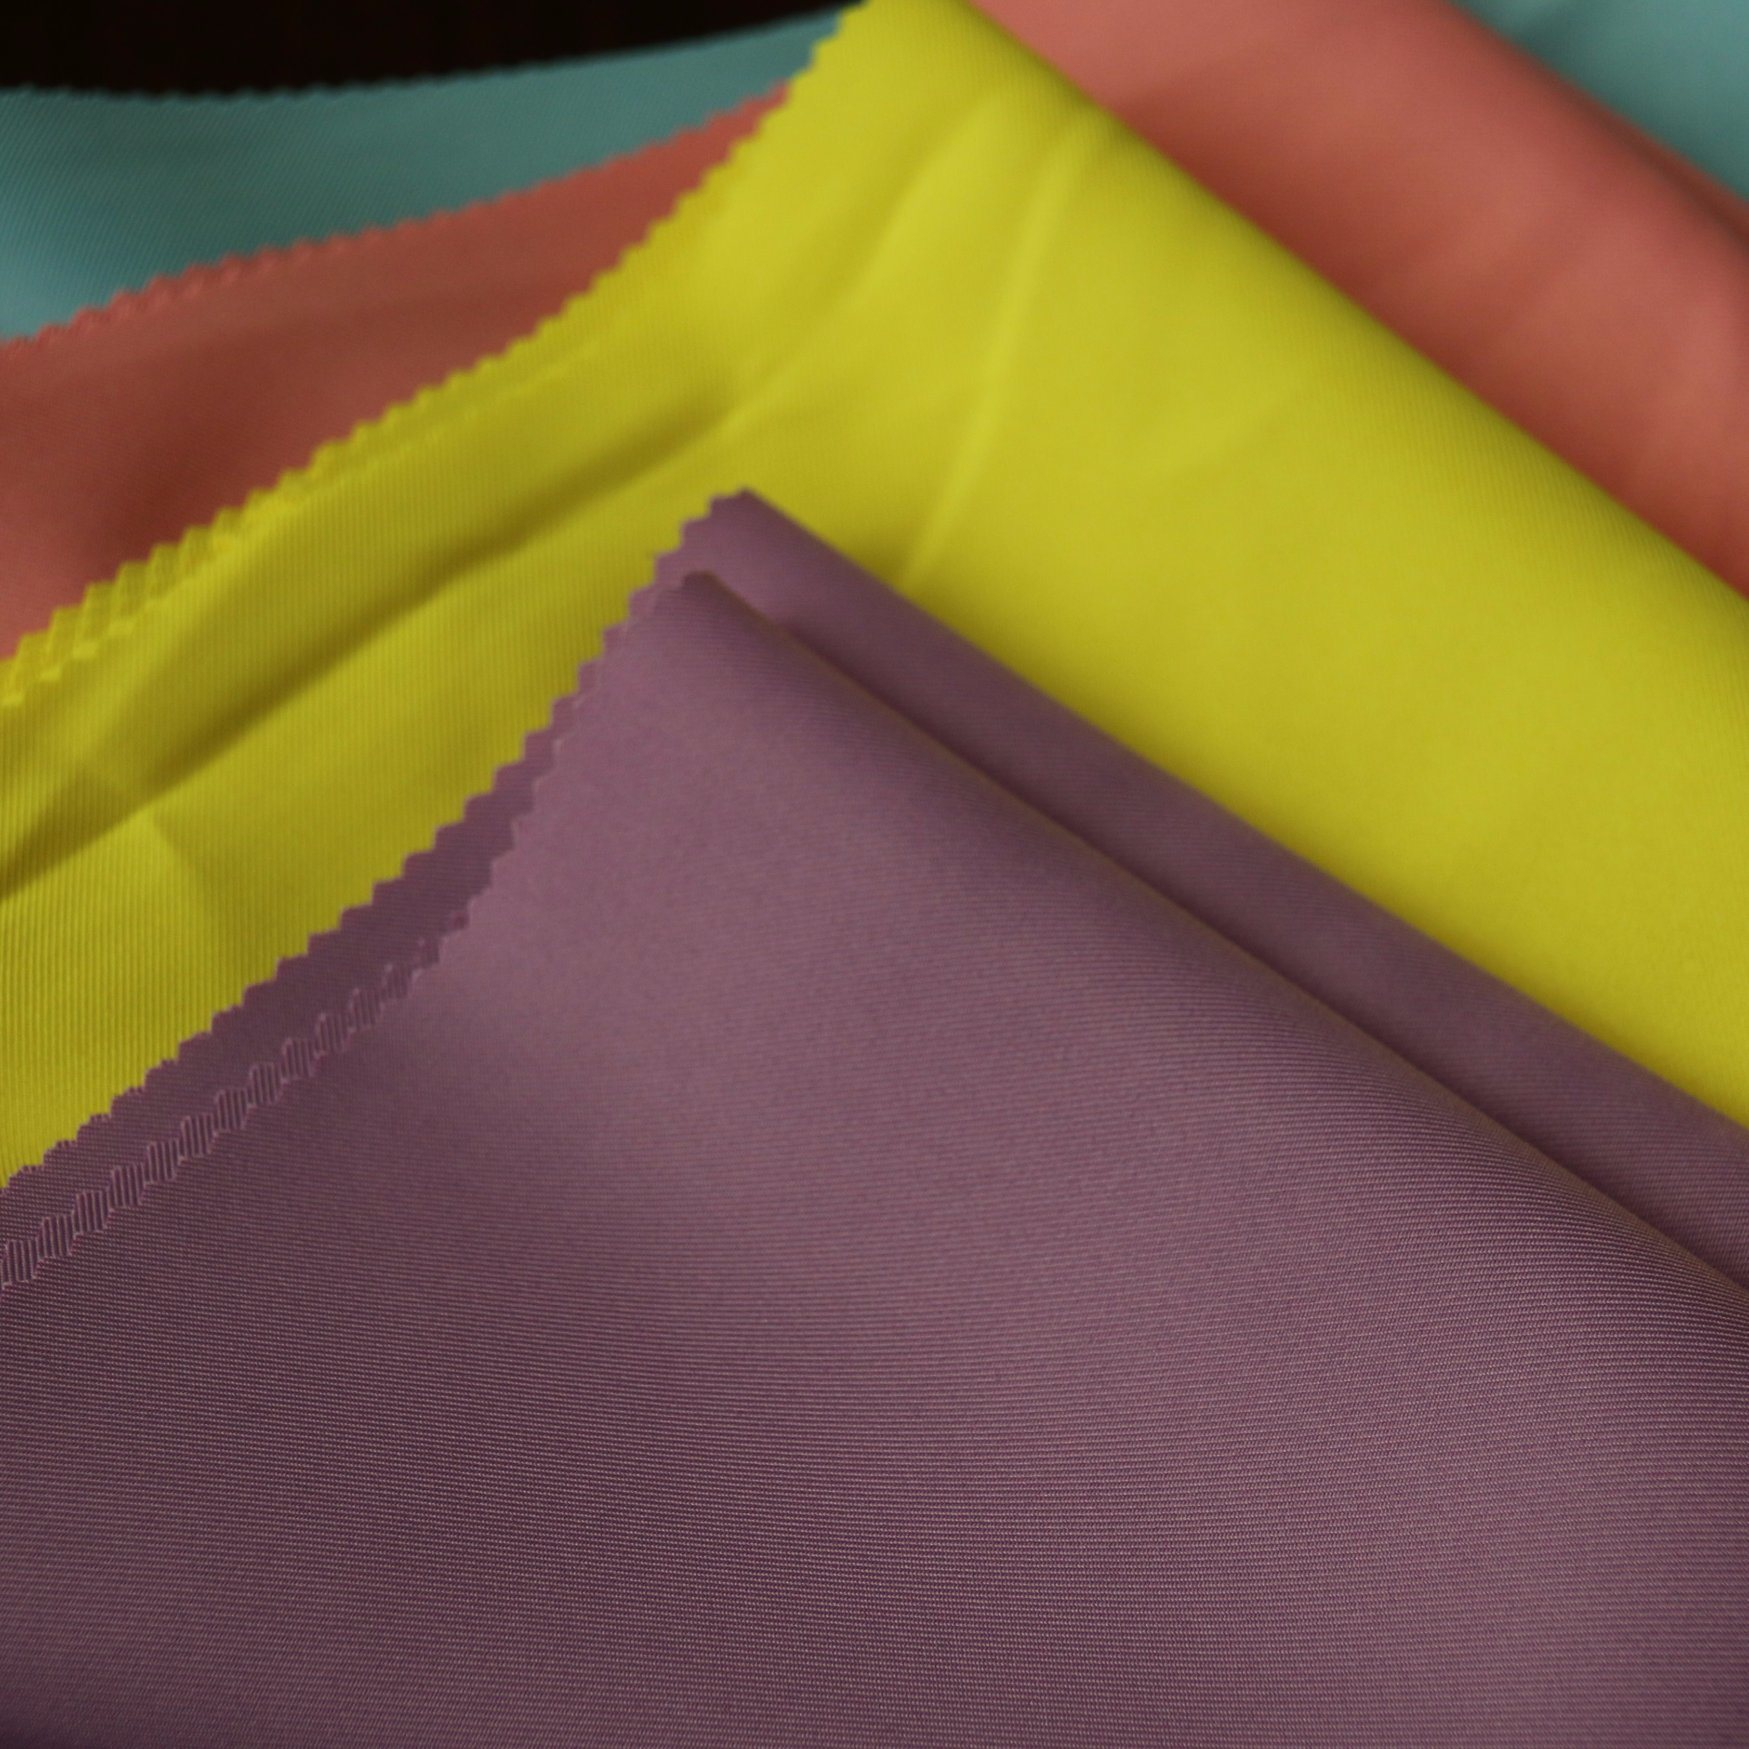 Polyester 150d/48f*150d/48f 2/2twill Dyed Gaberdine for Uniform Workwear Fabric